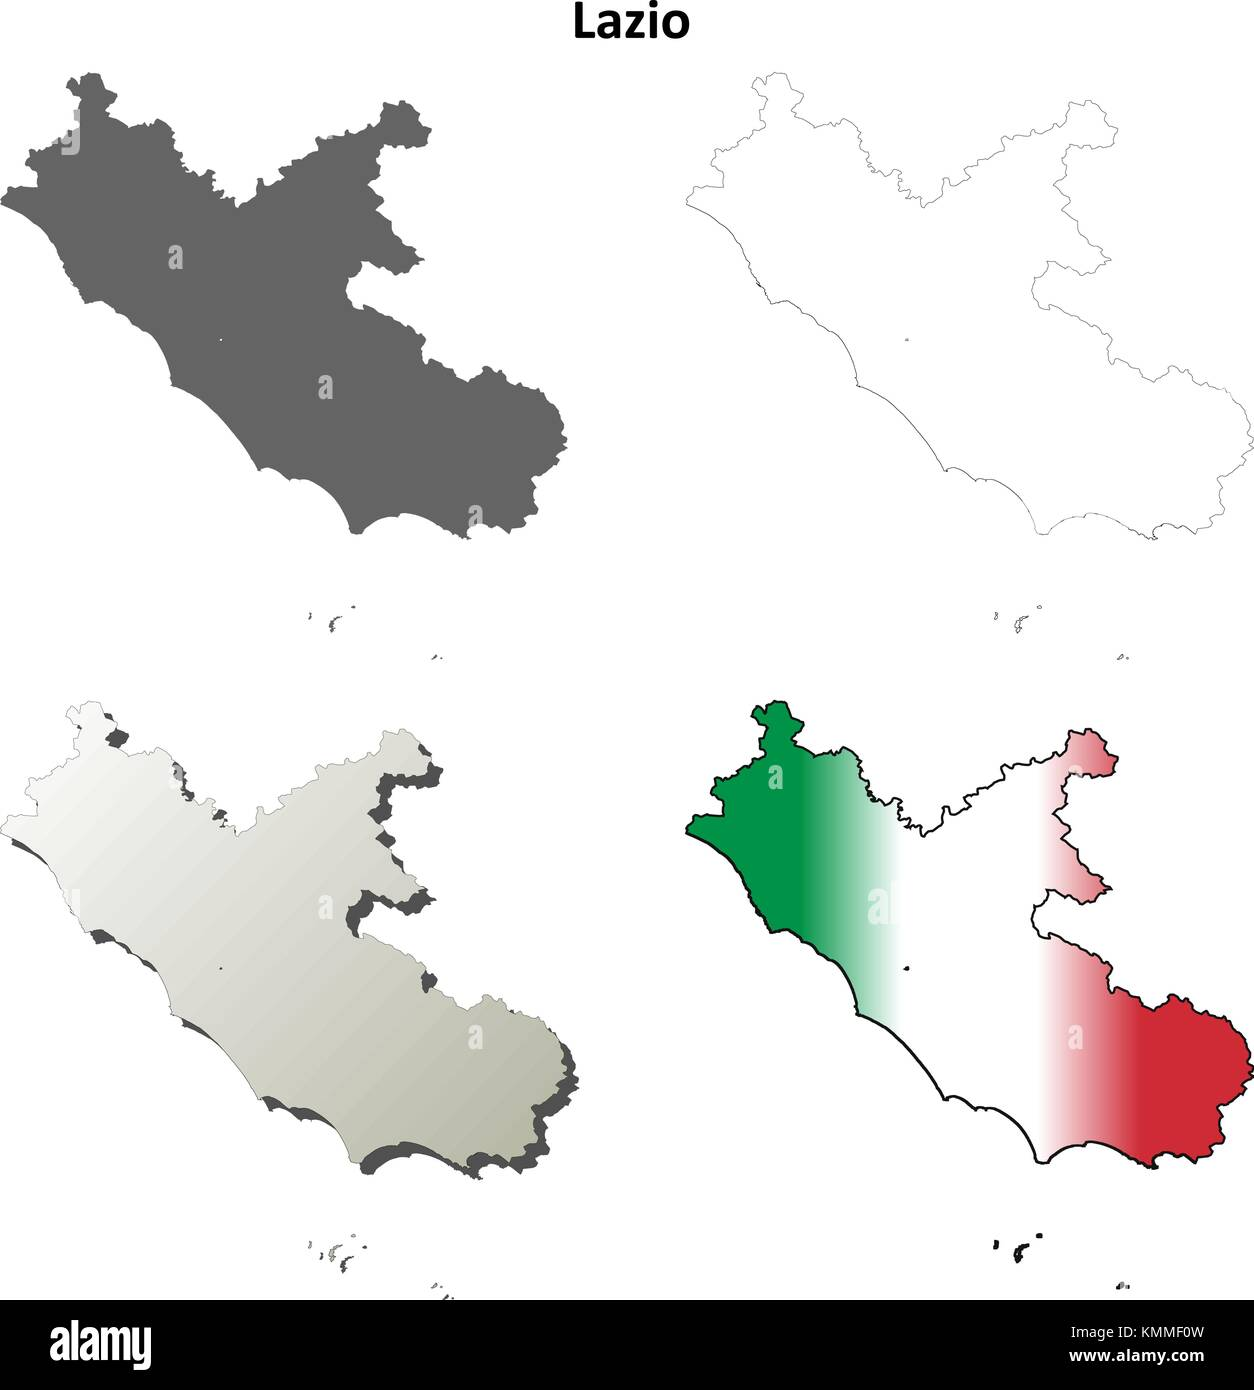 Lazio Map Vector Stock Photos & Lazio Map Vector Stock Images - Alamy